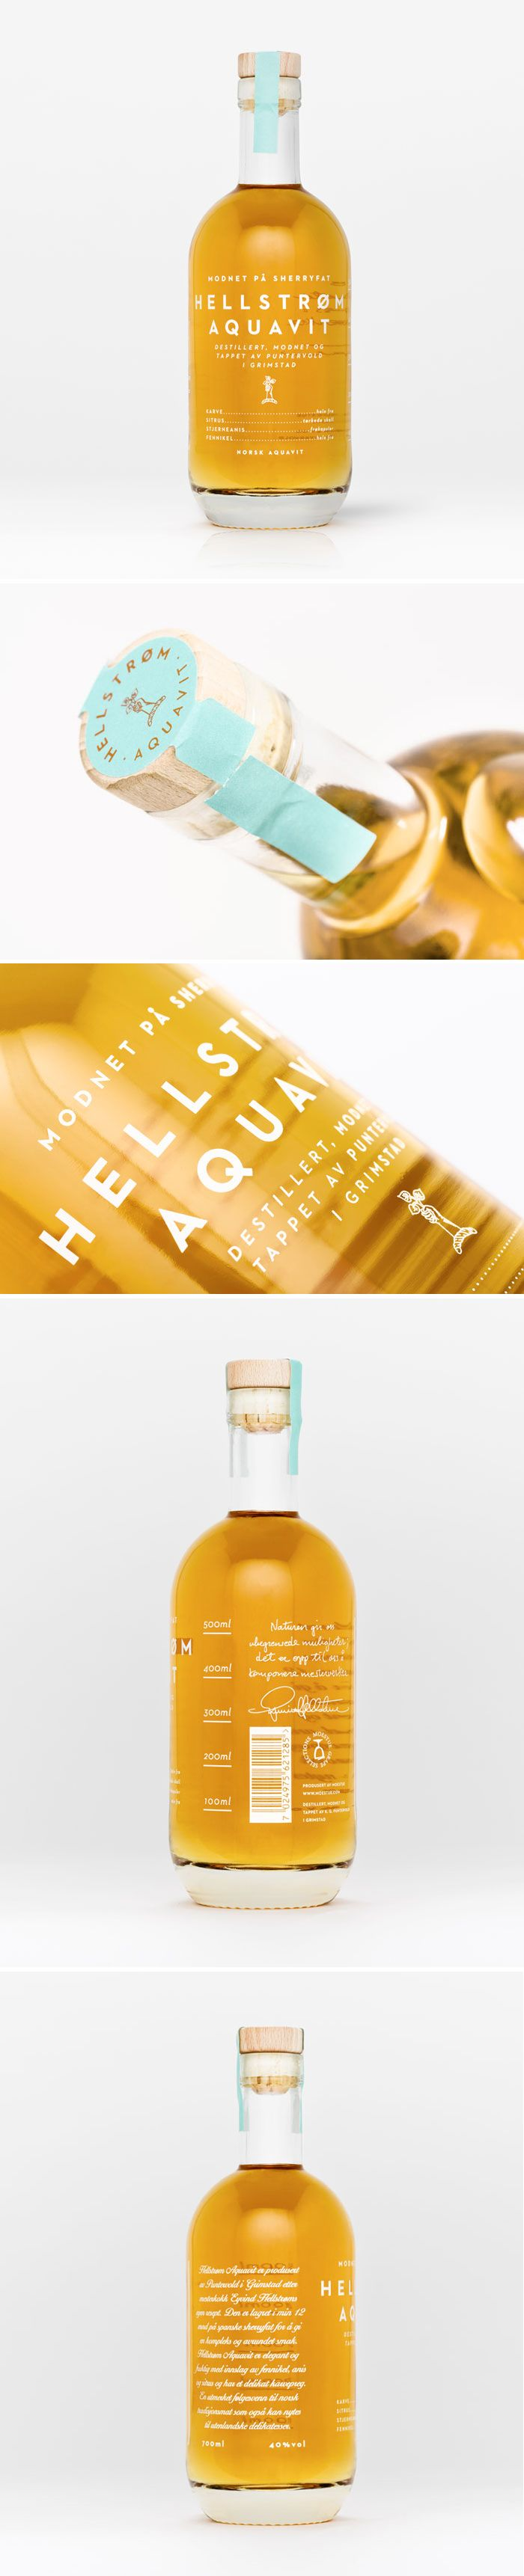 #packaging spirit mxm